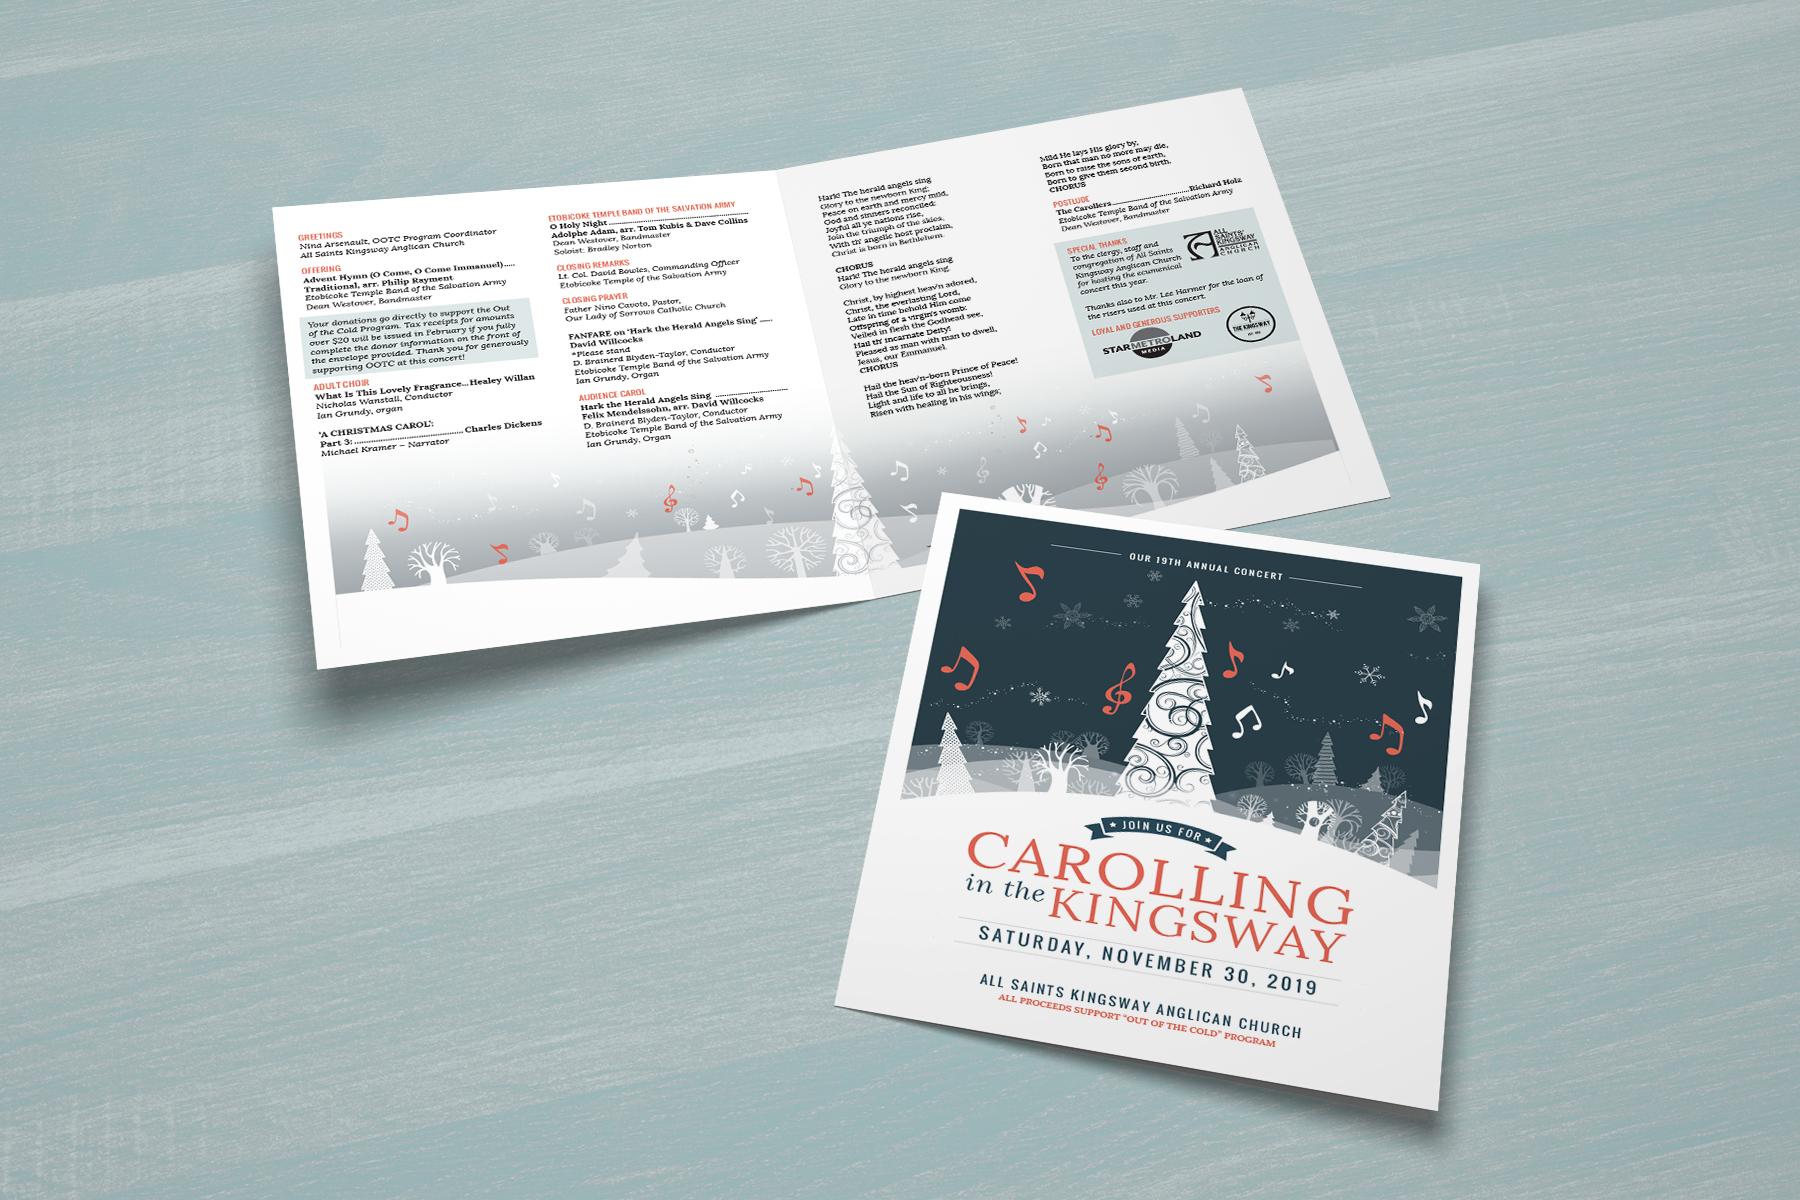 Carolling on the Kingsway Booklet Design